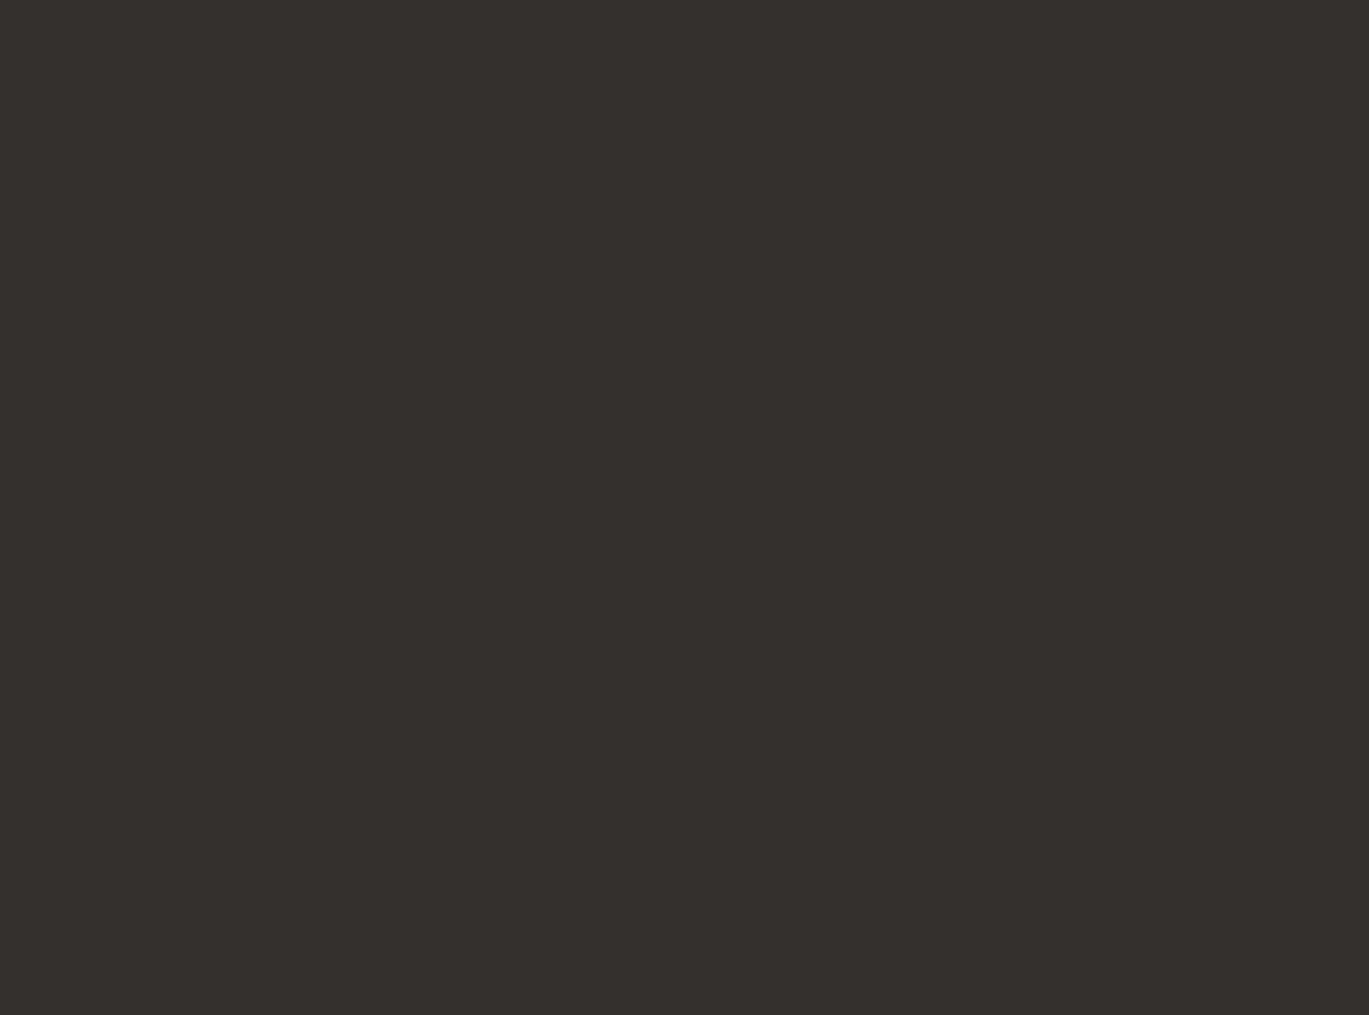 Инна Чурикова в фильме «Морозко». Фотографии: tainyvselennoi.ru